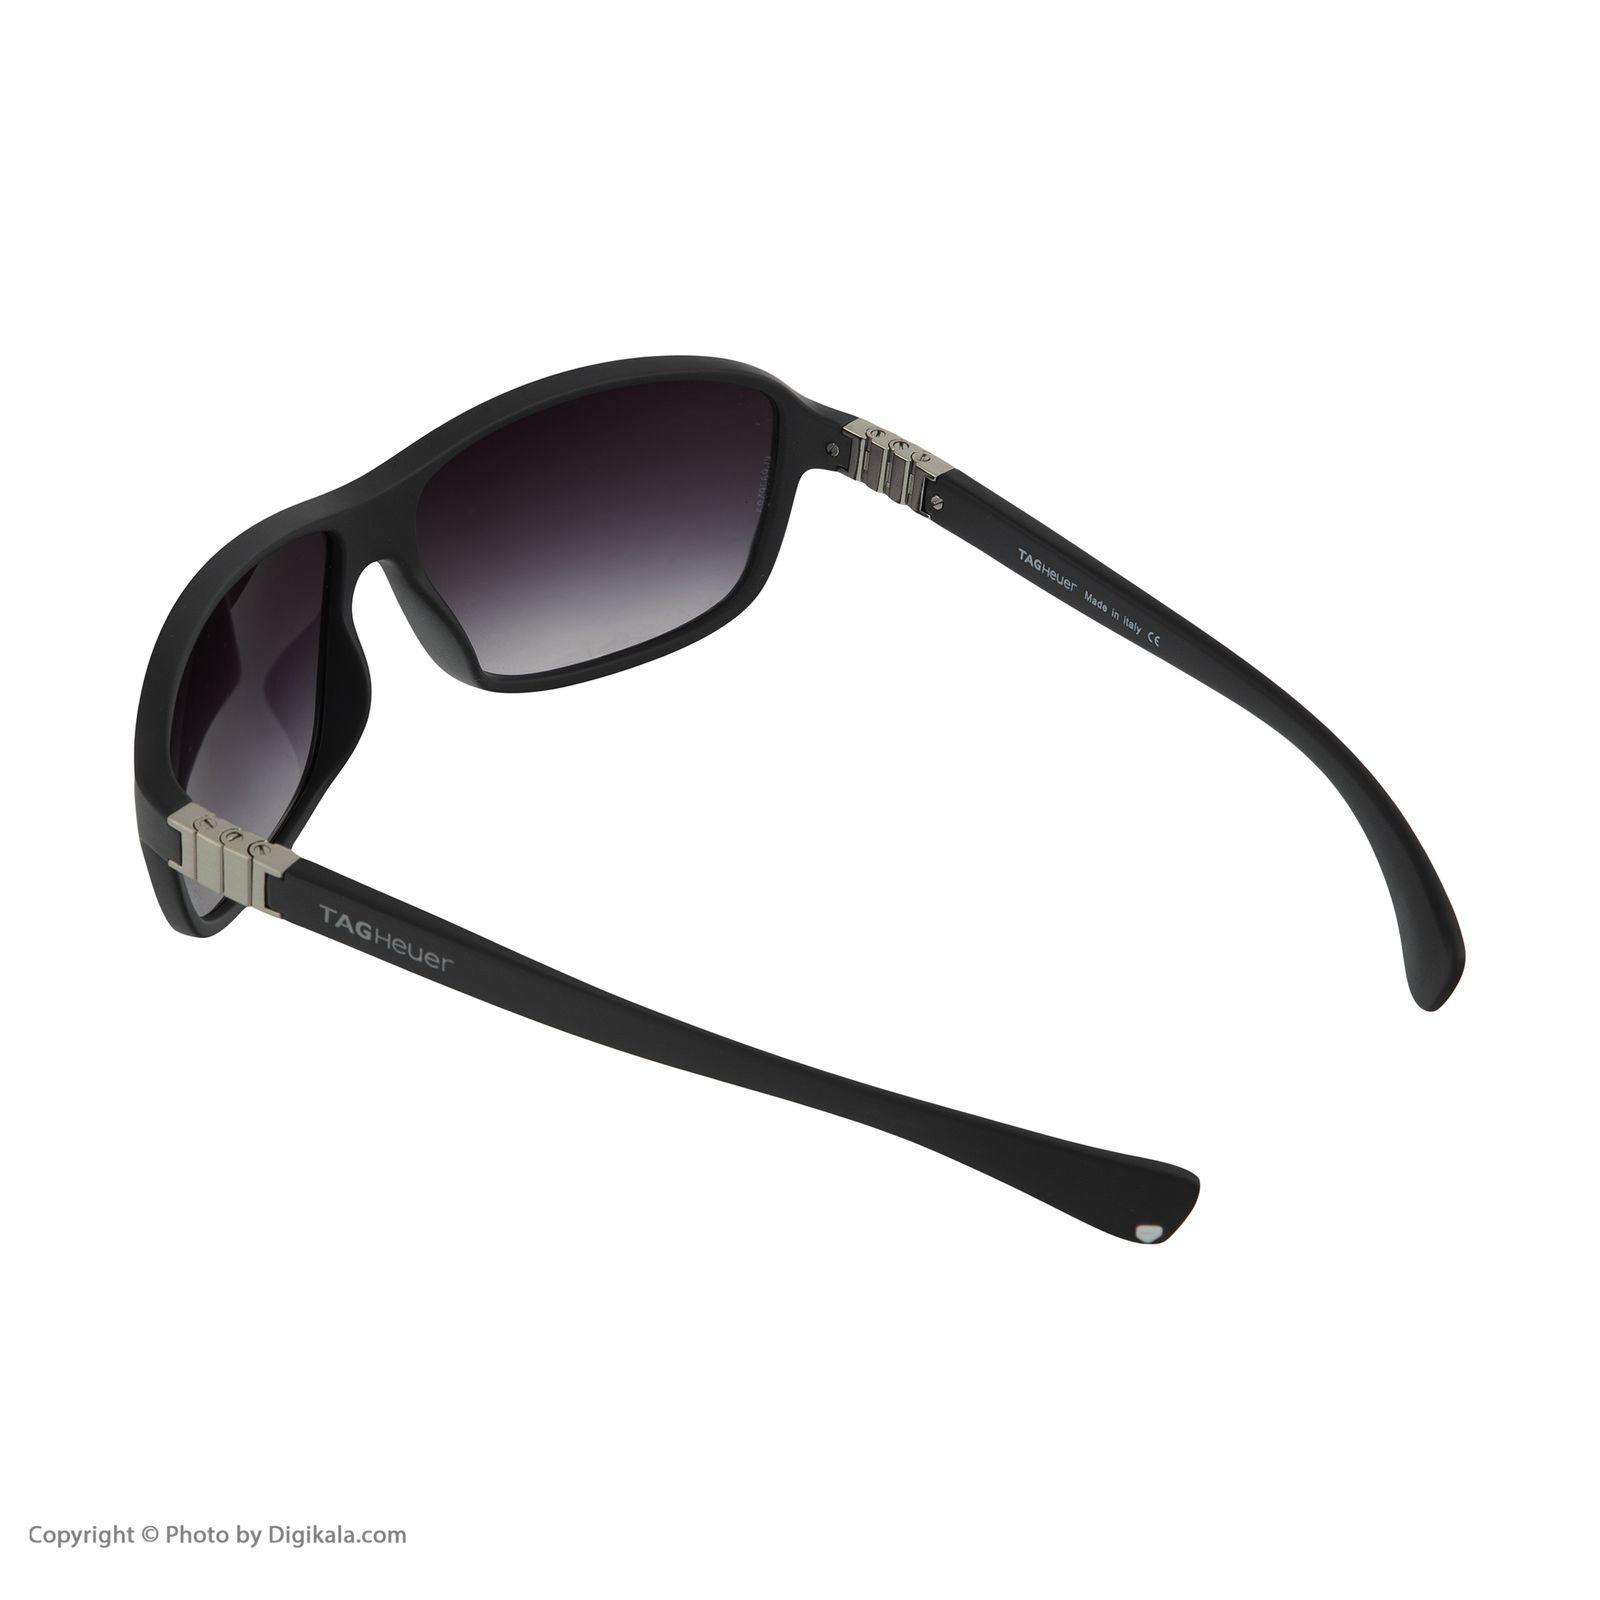 عینک آفتابی تگ هویر مدل 9302 -  - 6